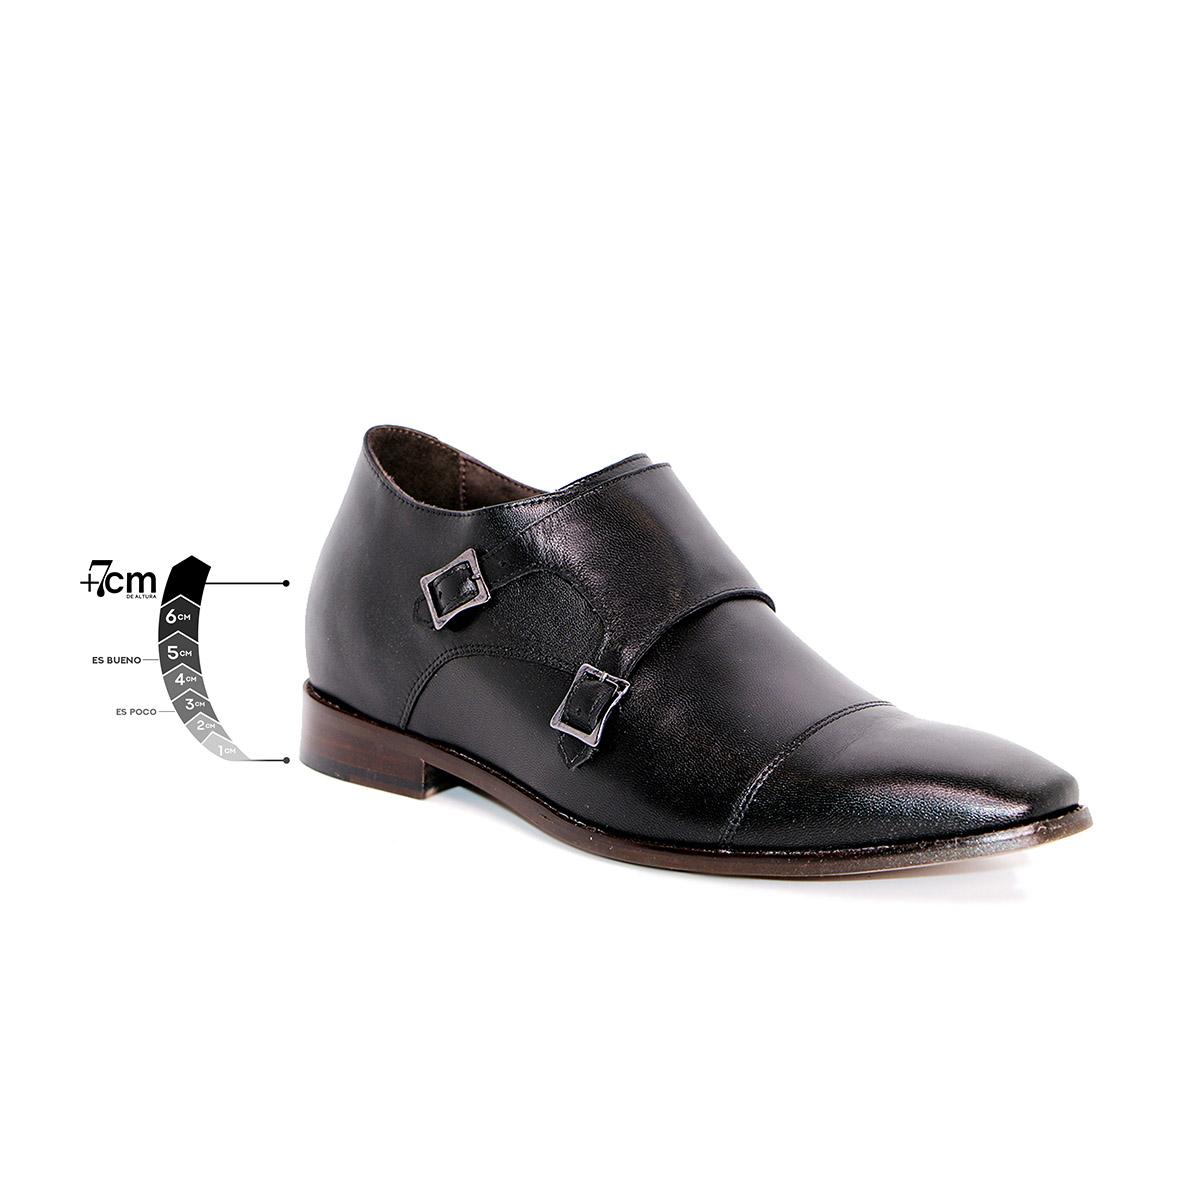 Zapato Formal Lawyers Negro Max Denegri +7cms De Altura_75317